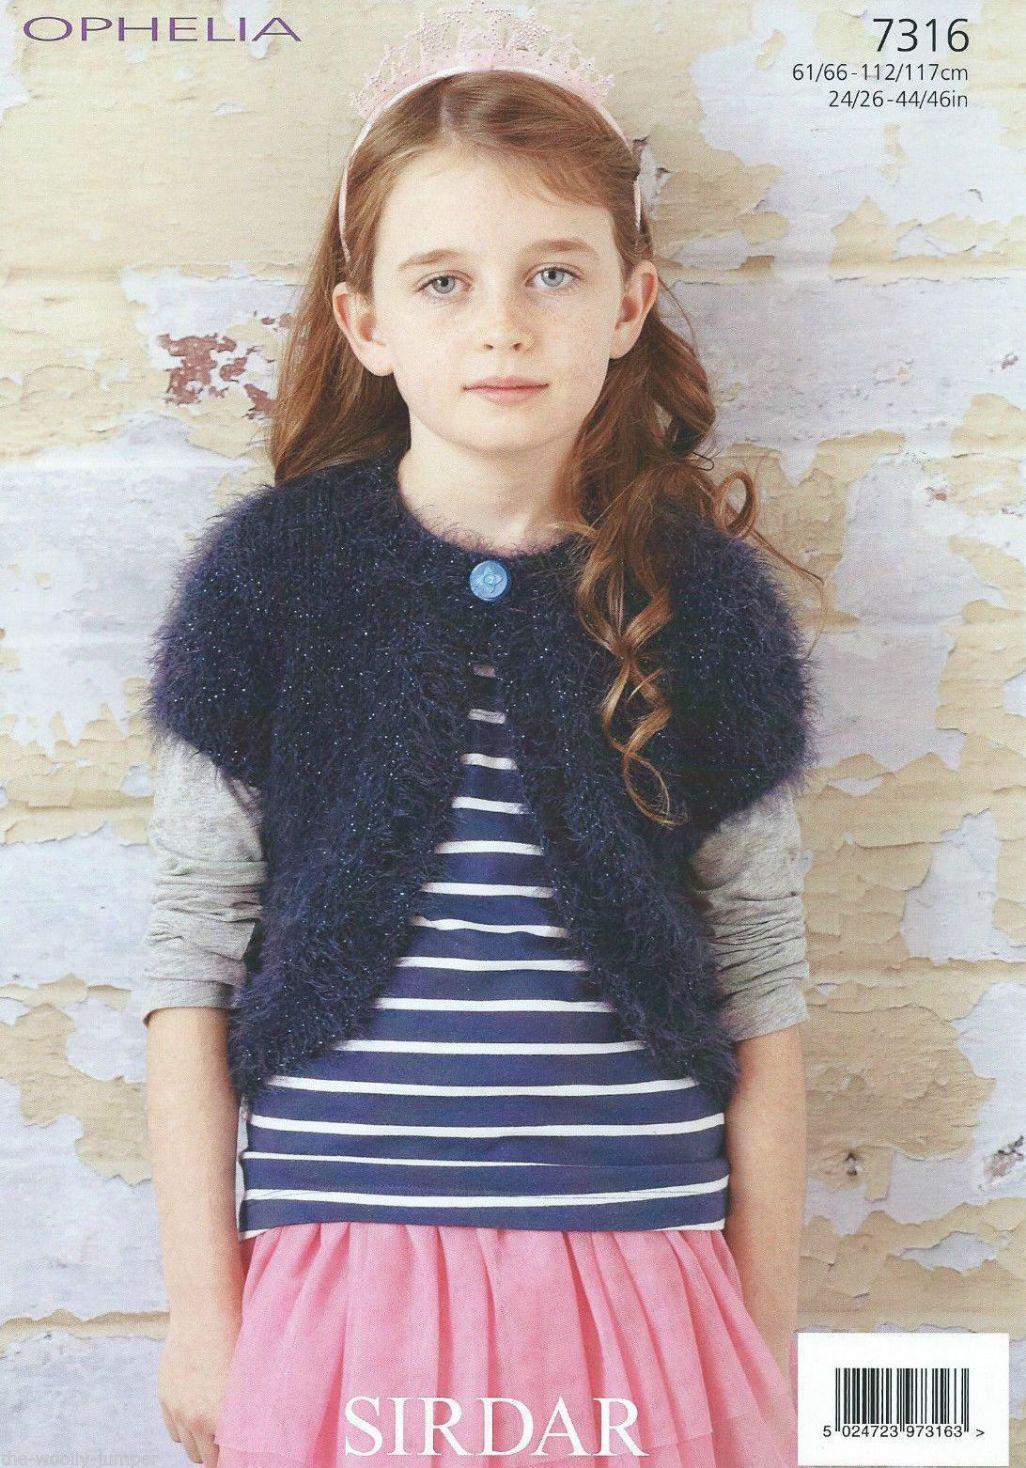 7316 Sirdar Ophelia Chunky Bolero Knitting Pattern To Fit 24 To 46